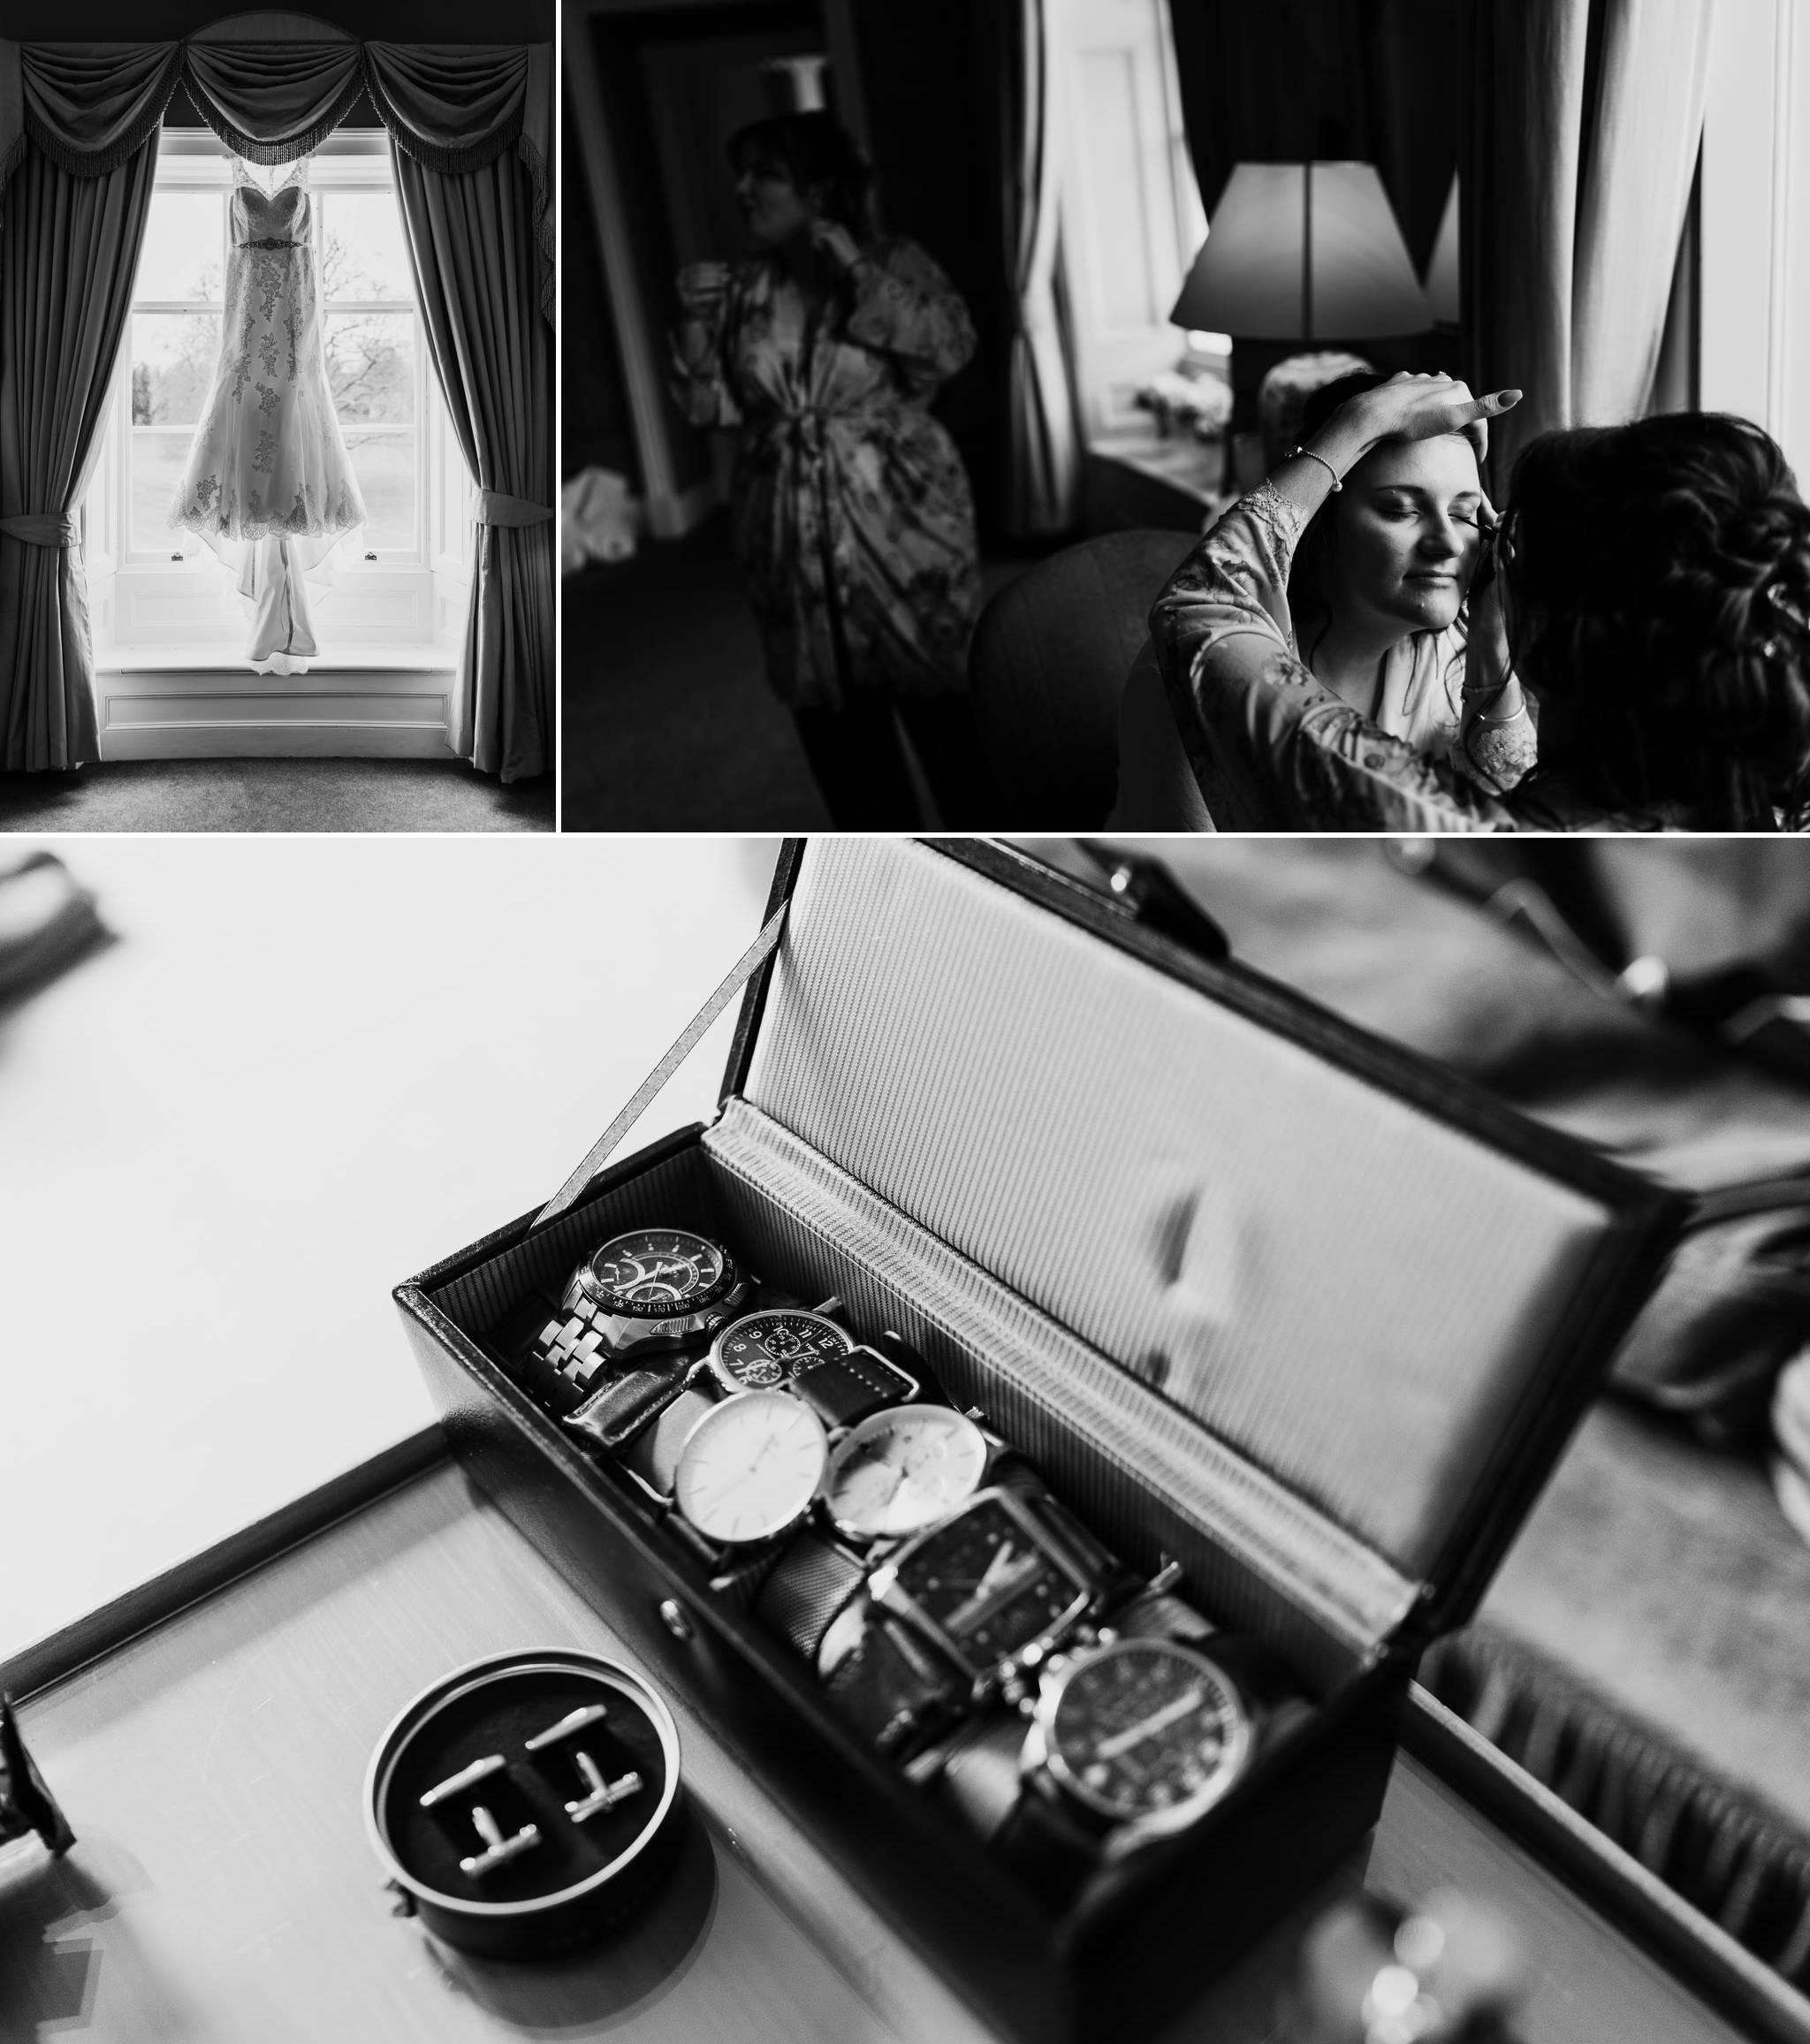 stubton-hall-wedding-photography 4.jpg